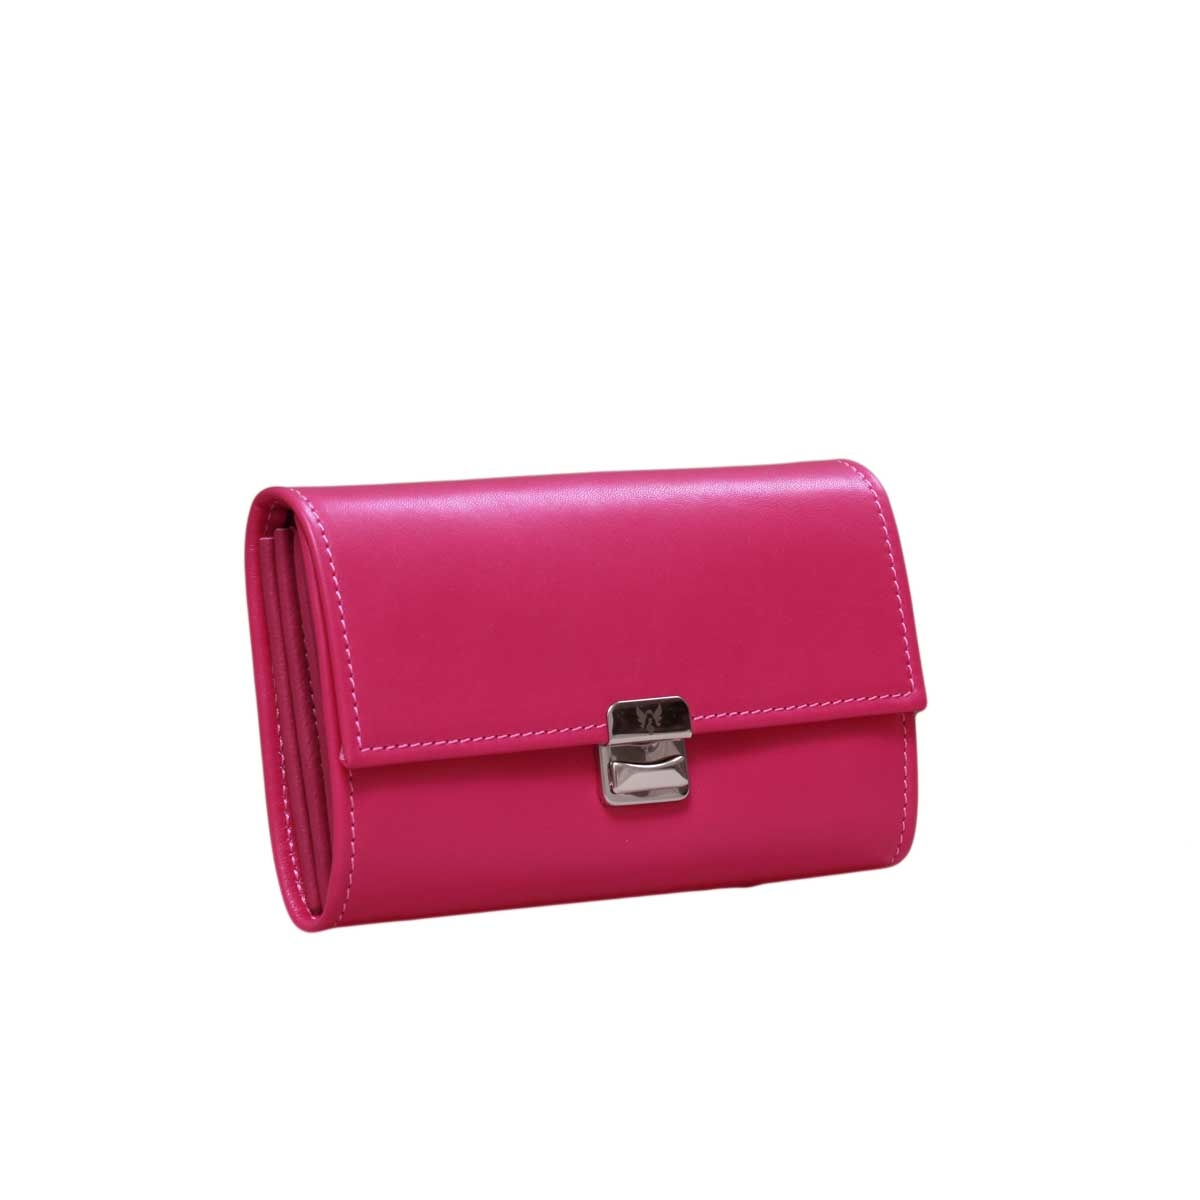 coole designer geldbörsen pink leder